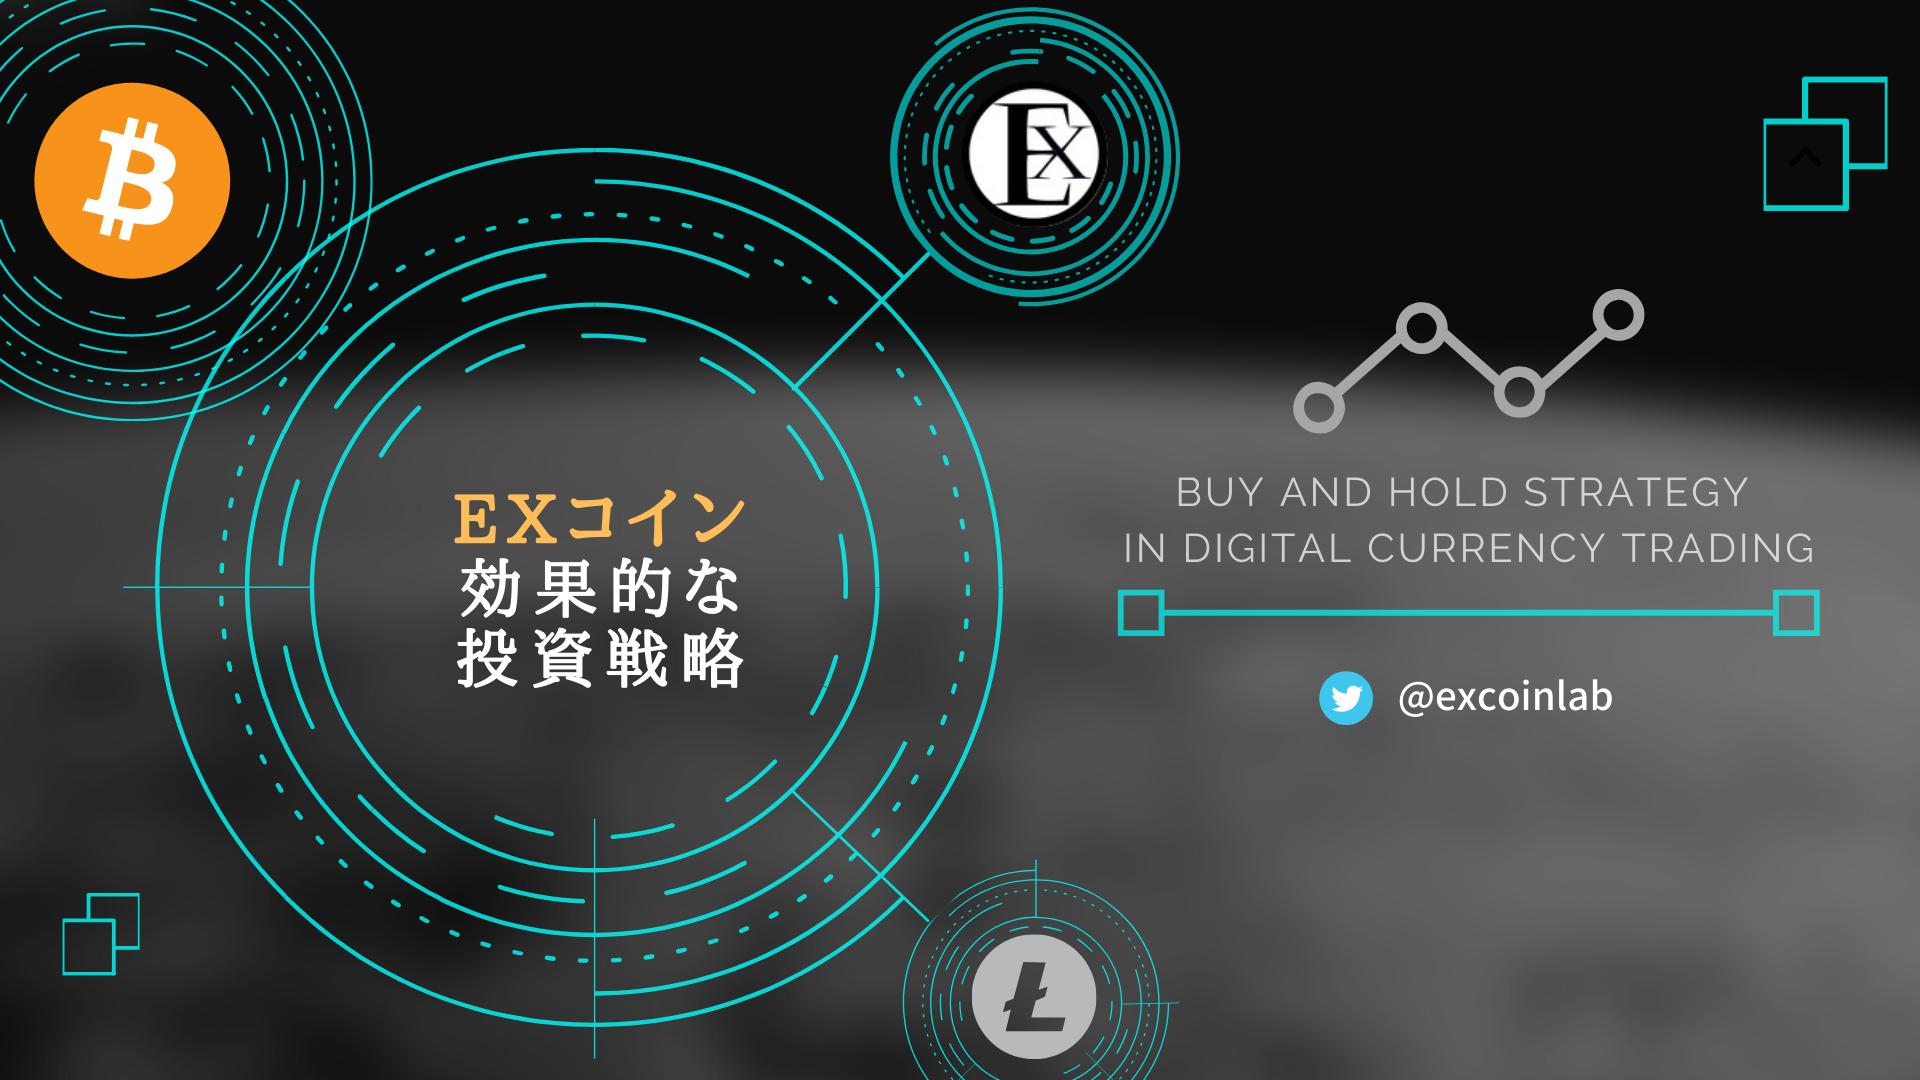 EXコインの効果的な投資戦略